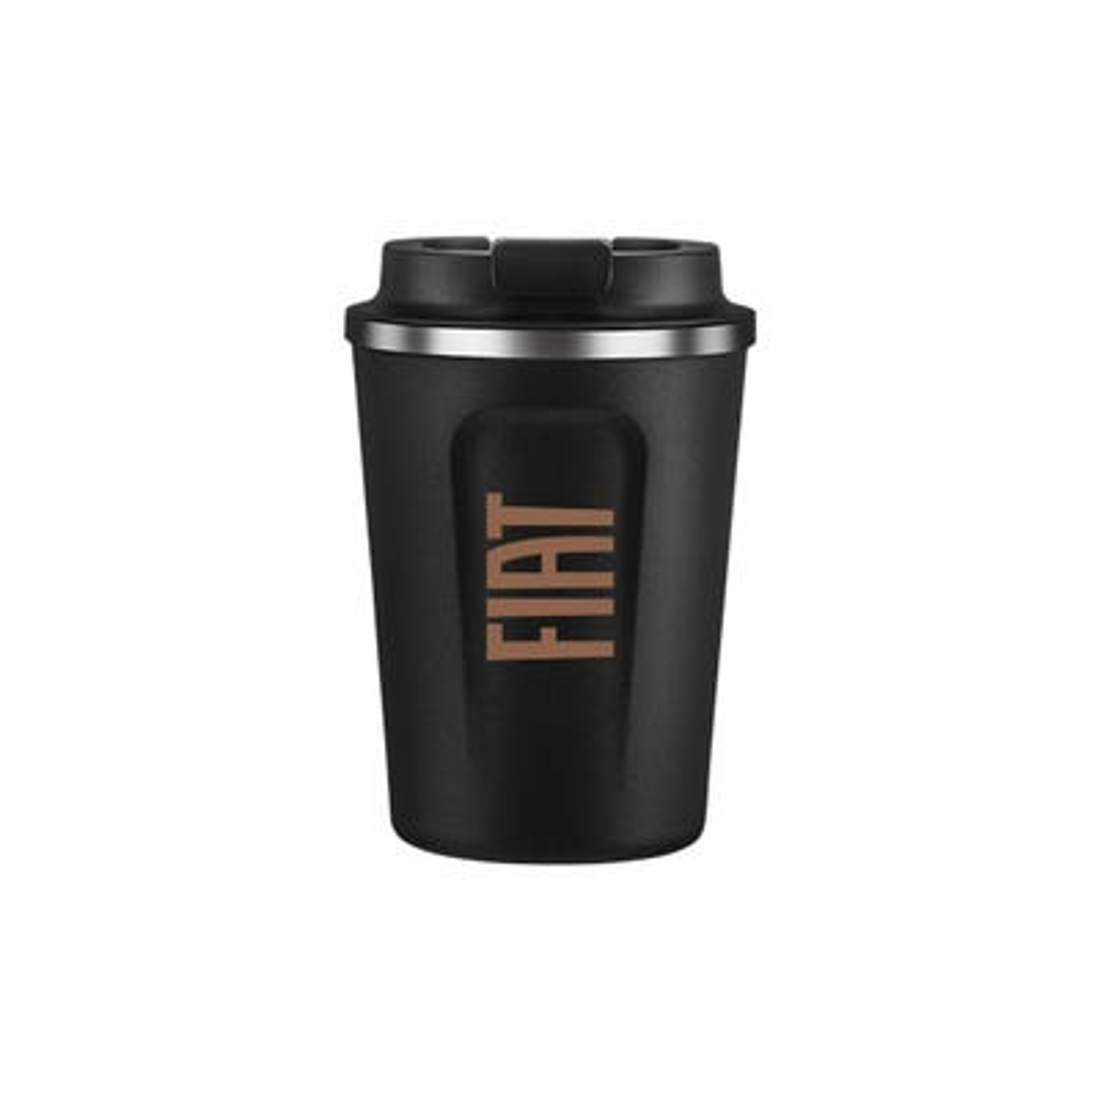 13 oz. Cafe Compact